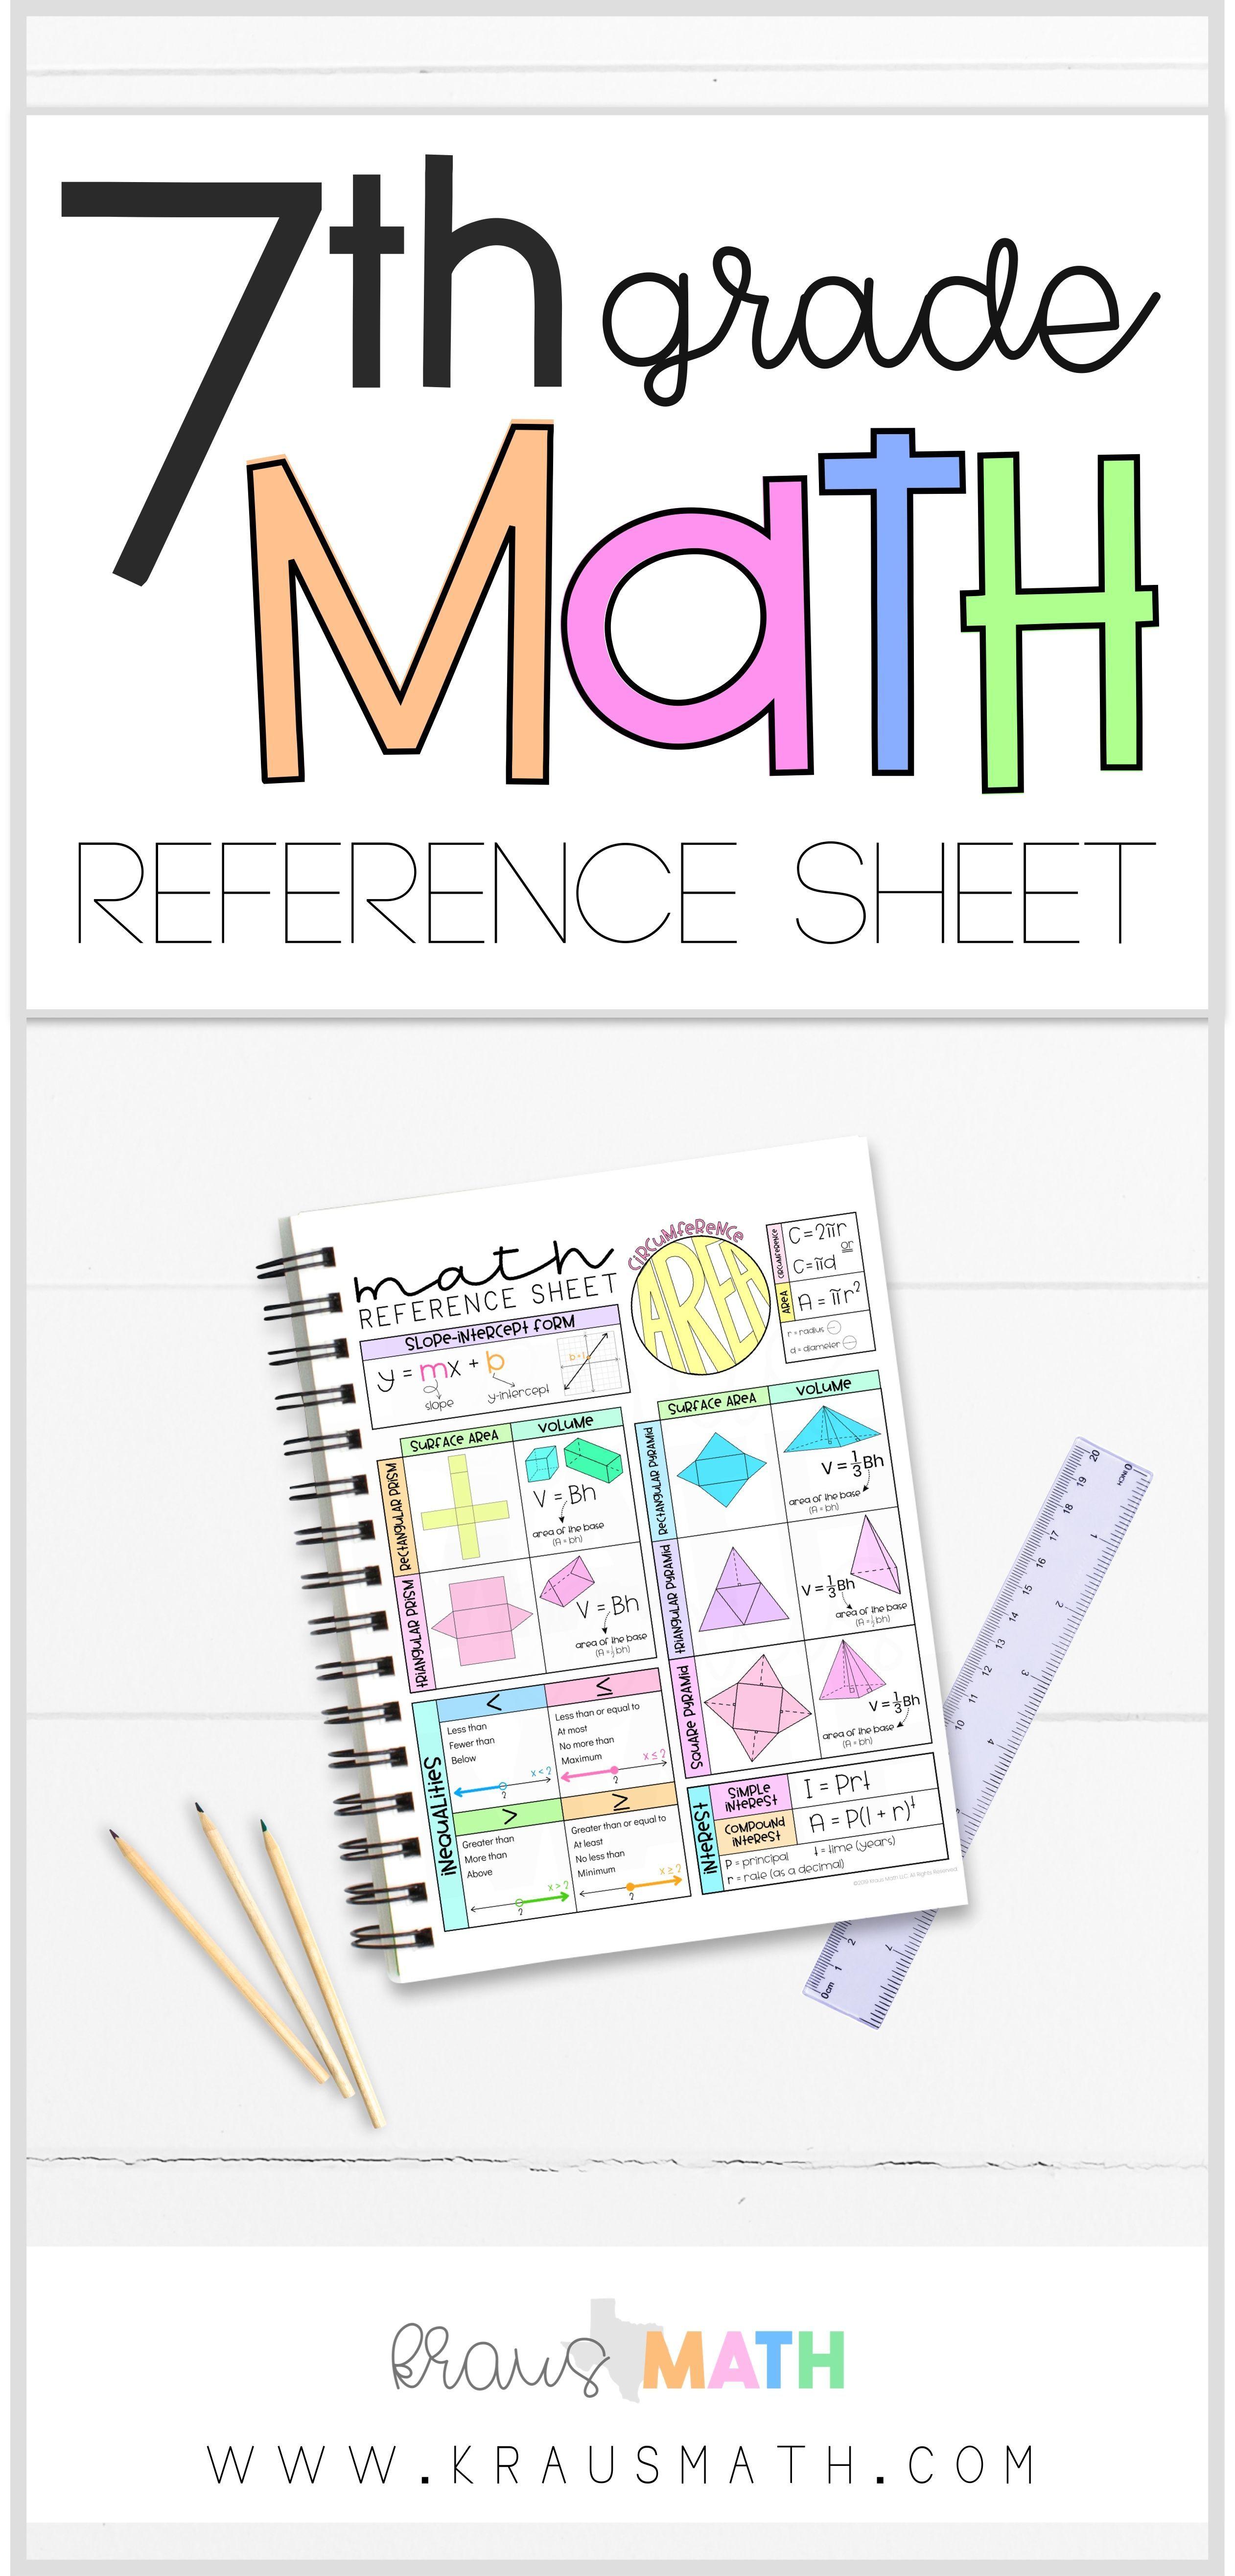 7th Grade Math Reference Sheet